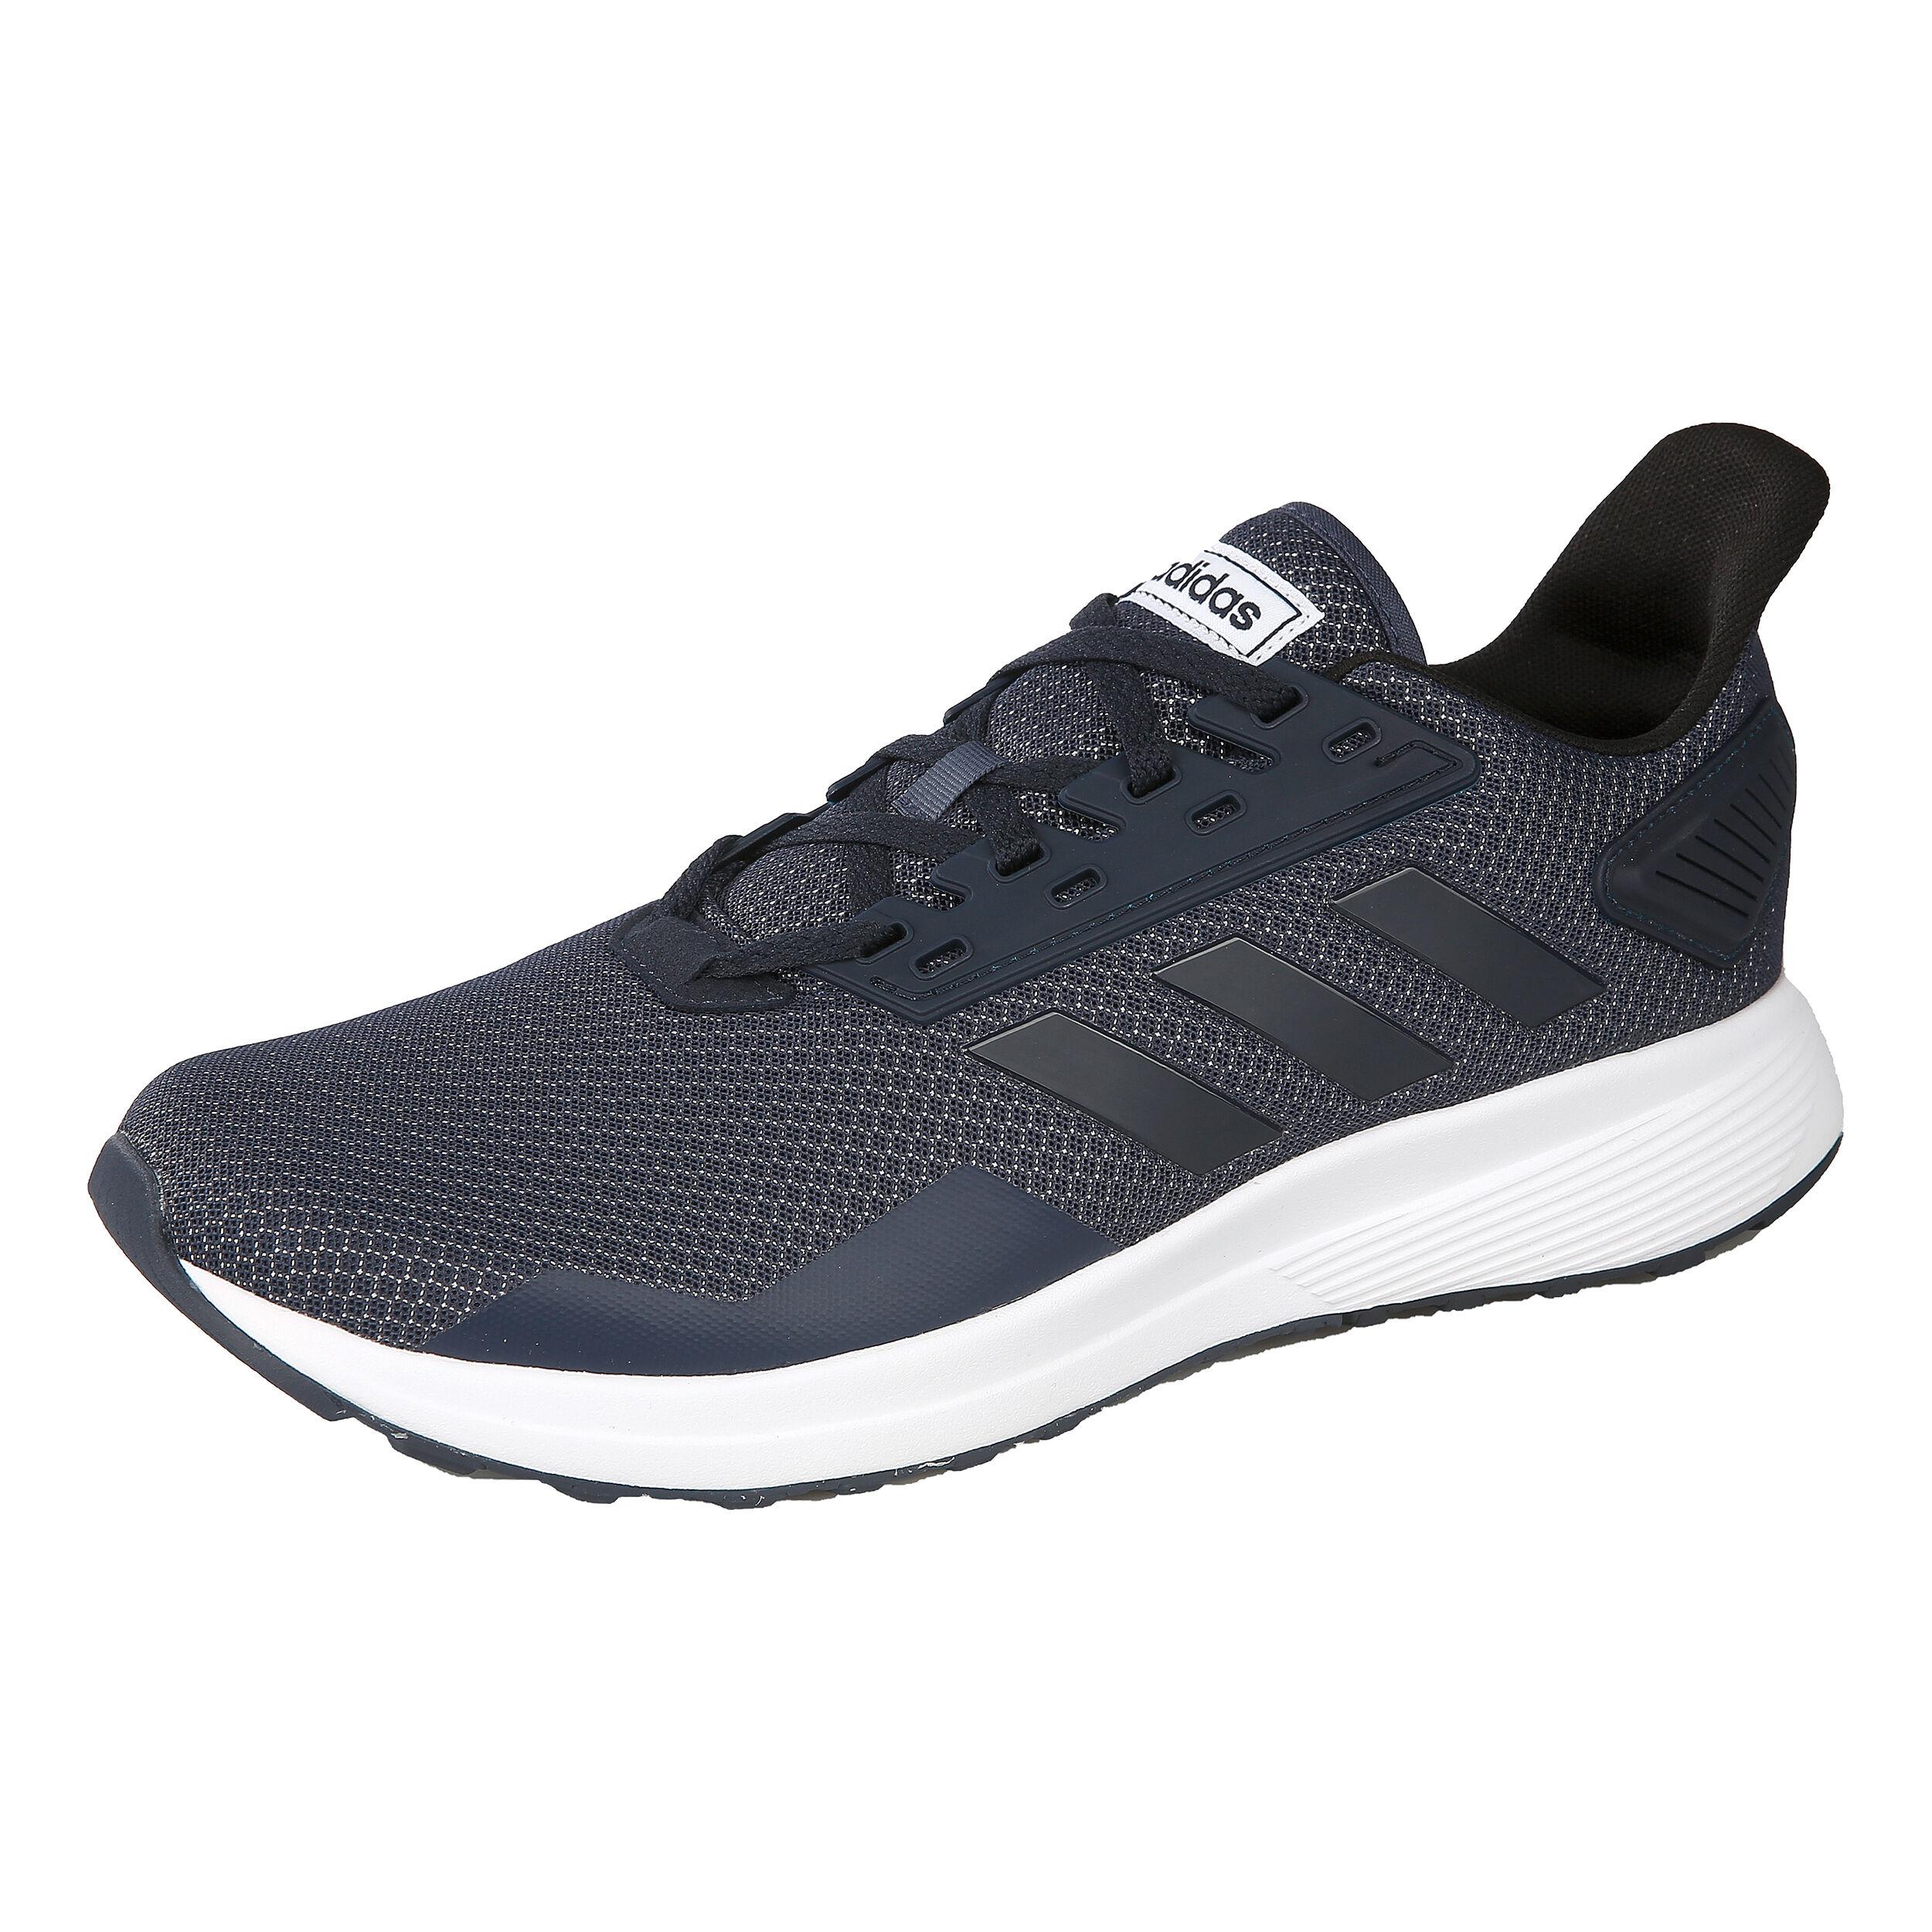 laufschuhe bis 50% reduziert jogging point  adidas laufschuhe � duramo 9 neutralschuh herren dunkelblau